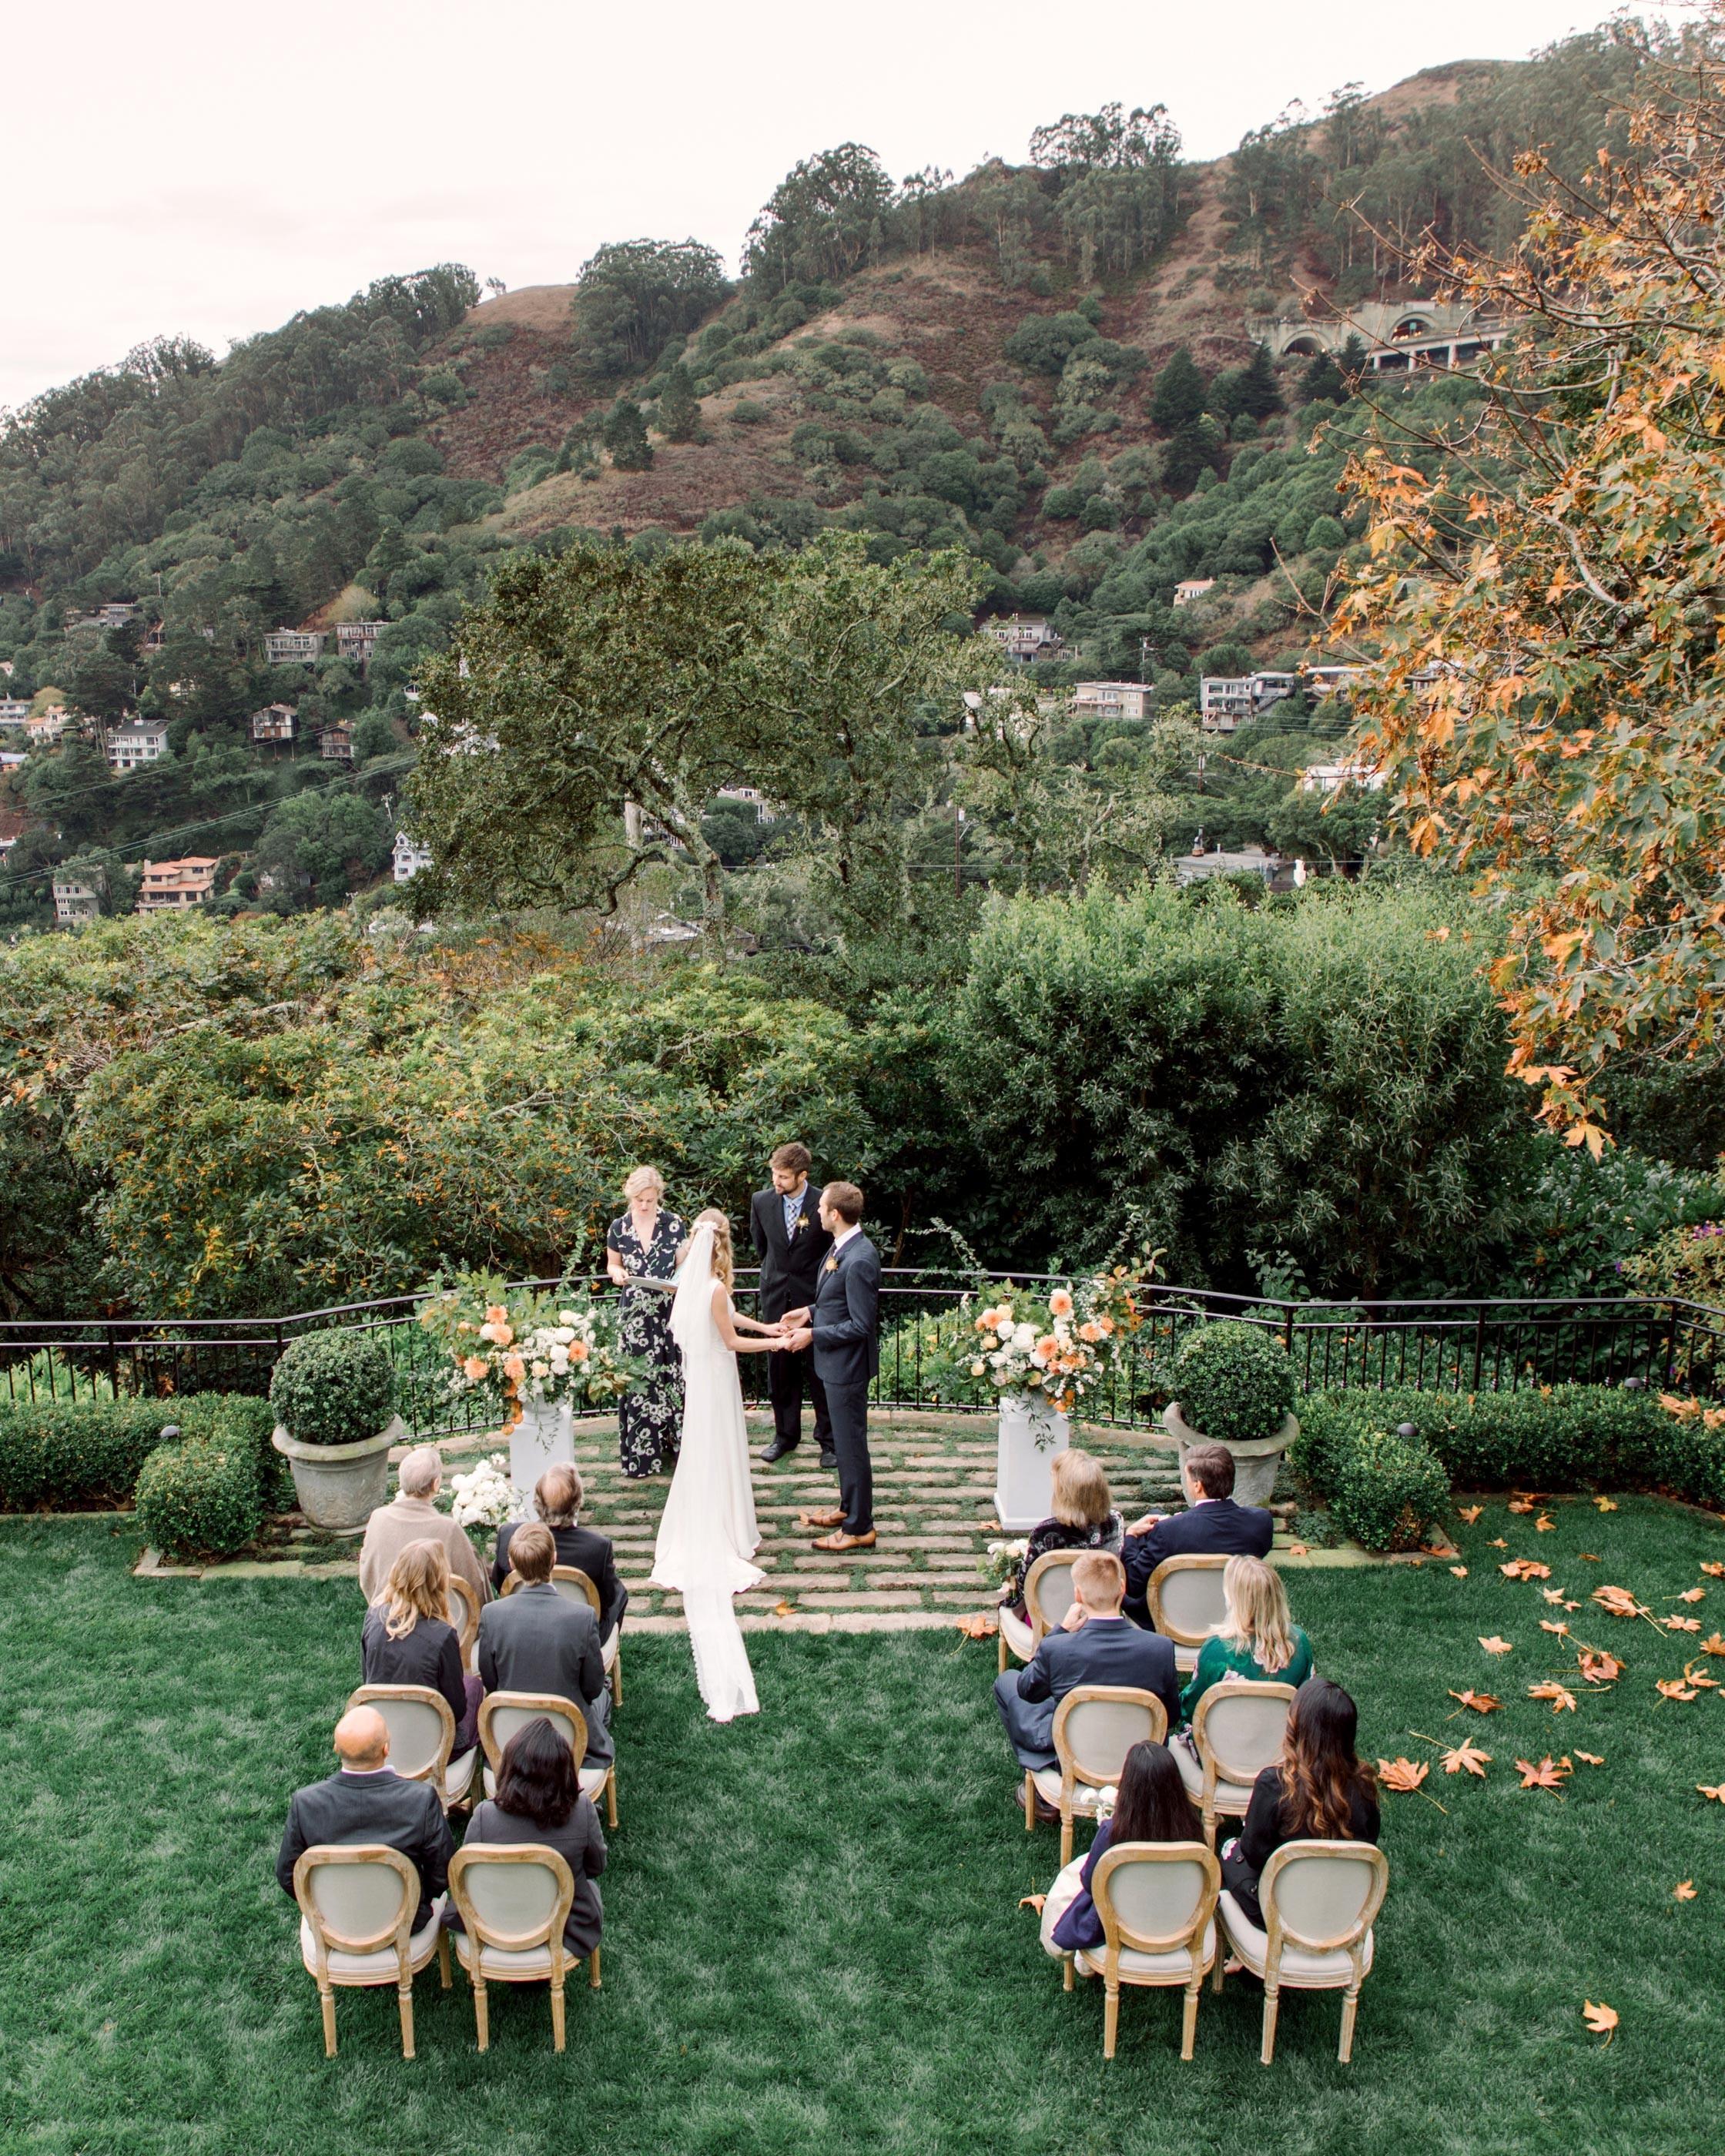 Wedding Ceremony Sites: An Intimate Backyard Wedding In Sausalito, California